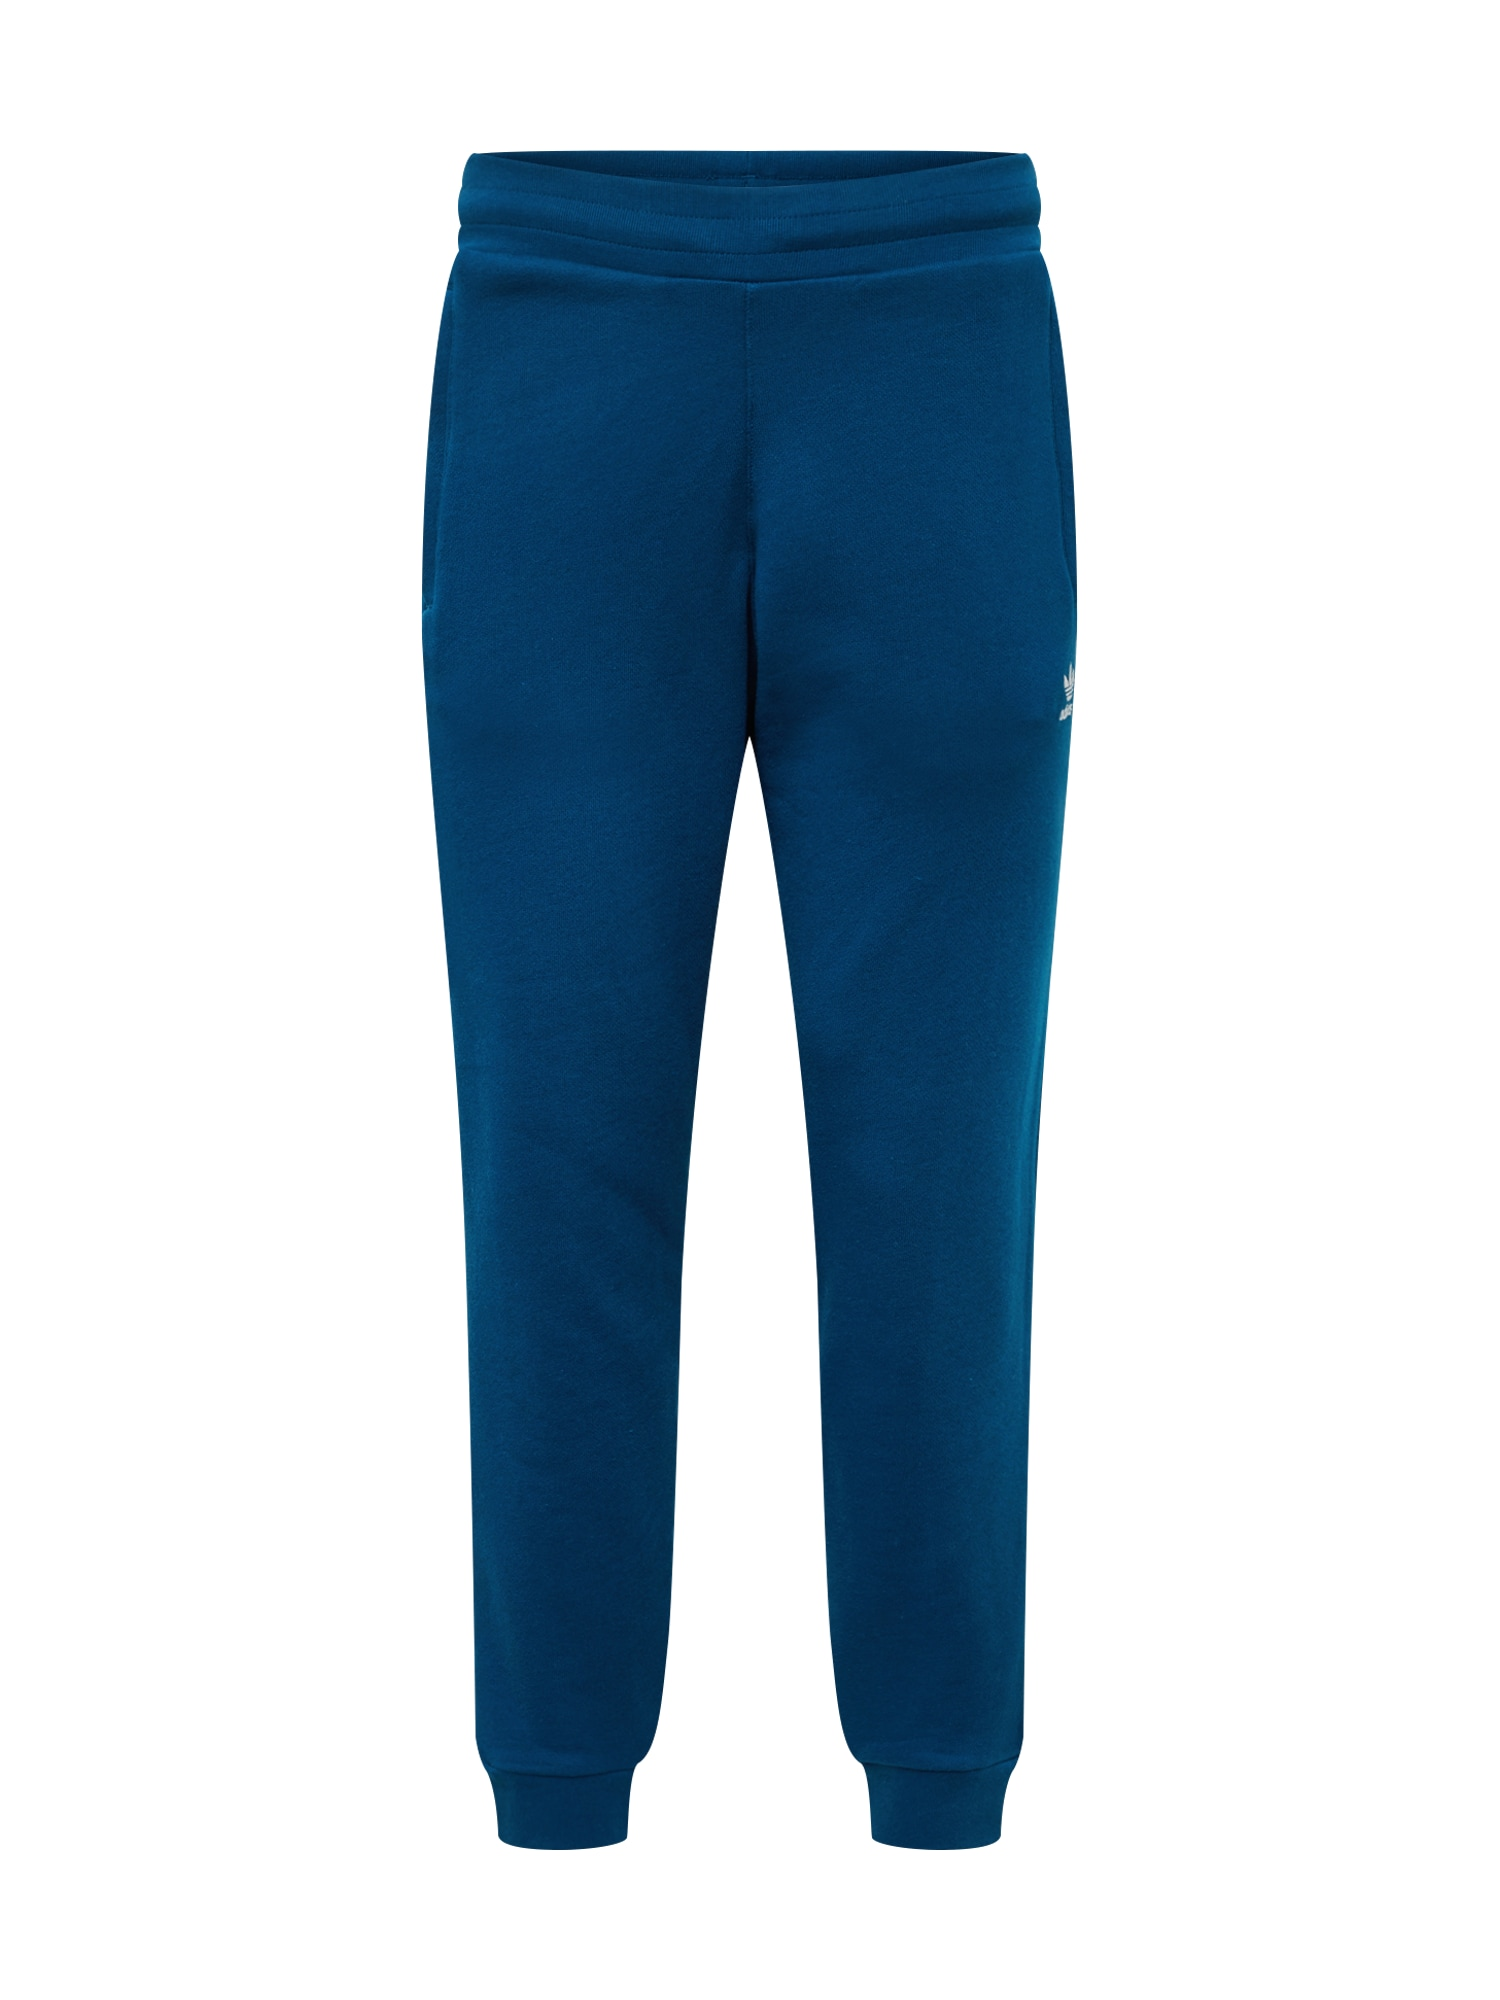 Kalhoty TREFOIL PANT marine modrá ADIDAS ORIGINALS